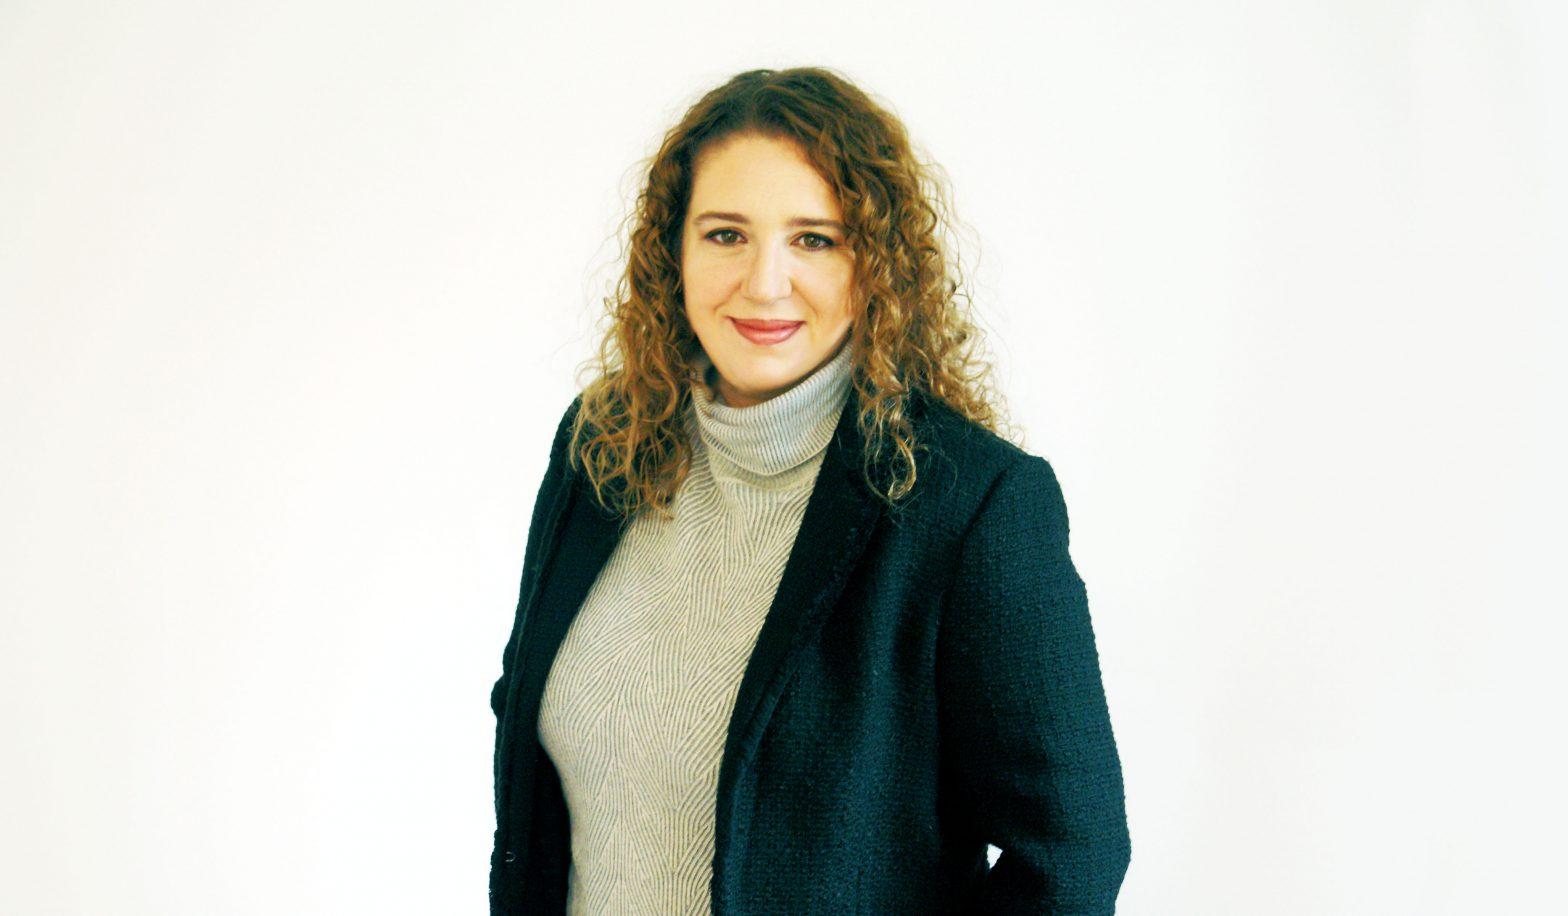 Chiara Plazzotta